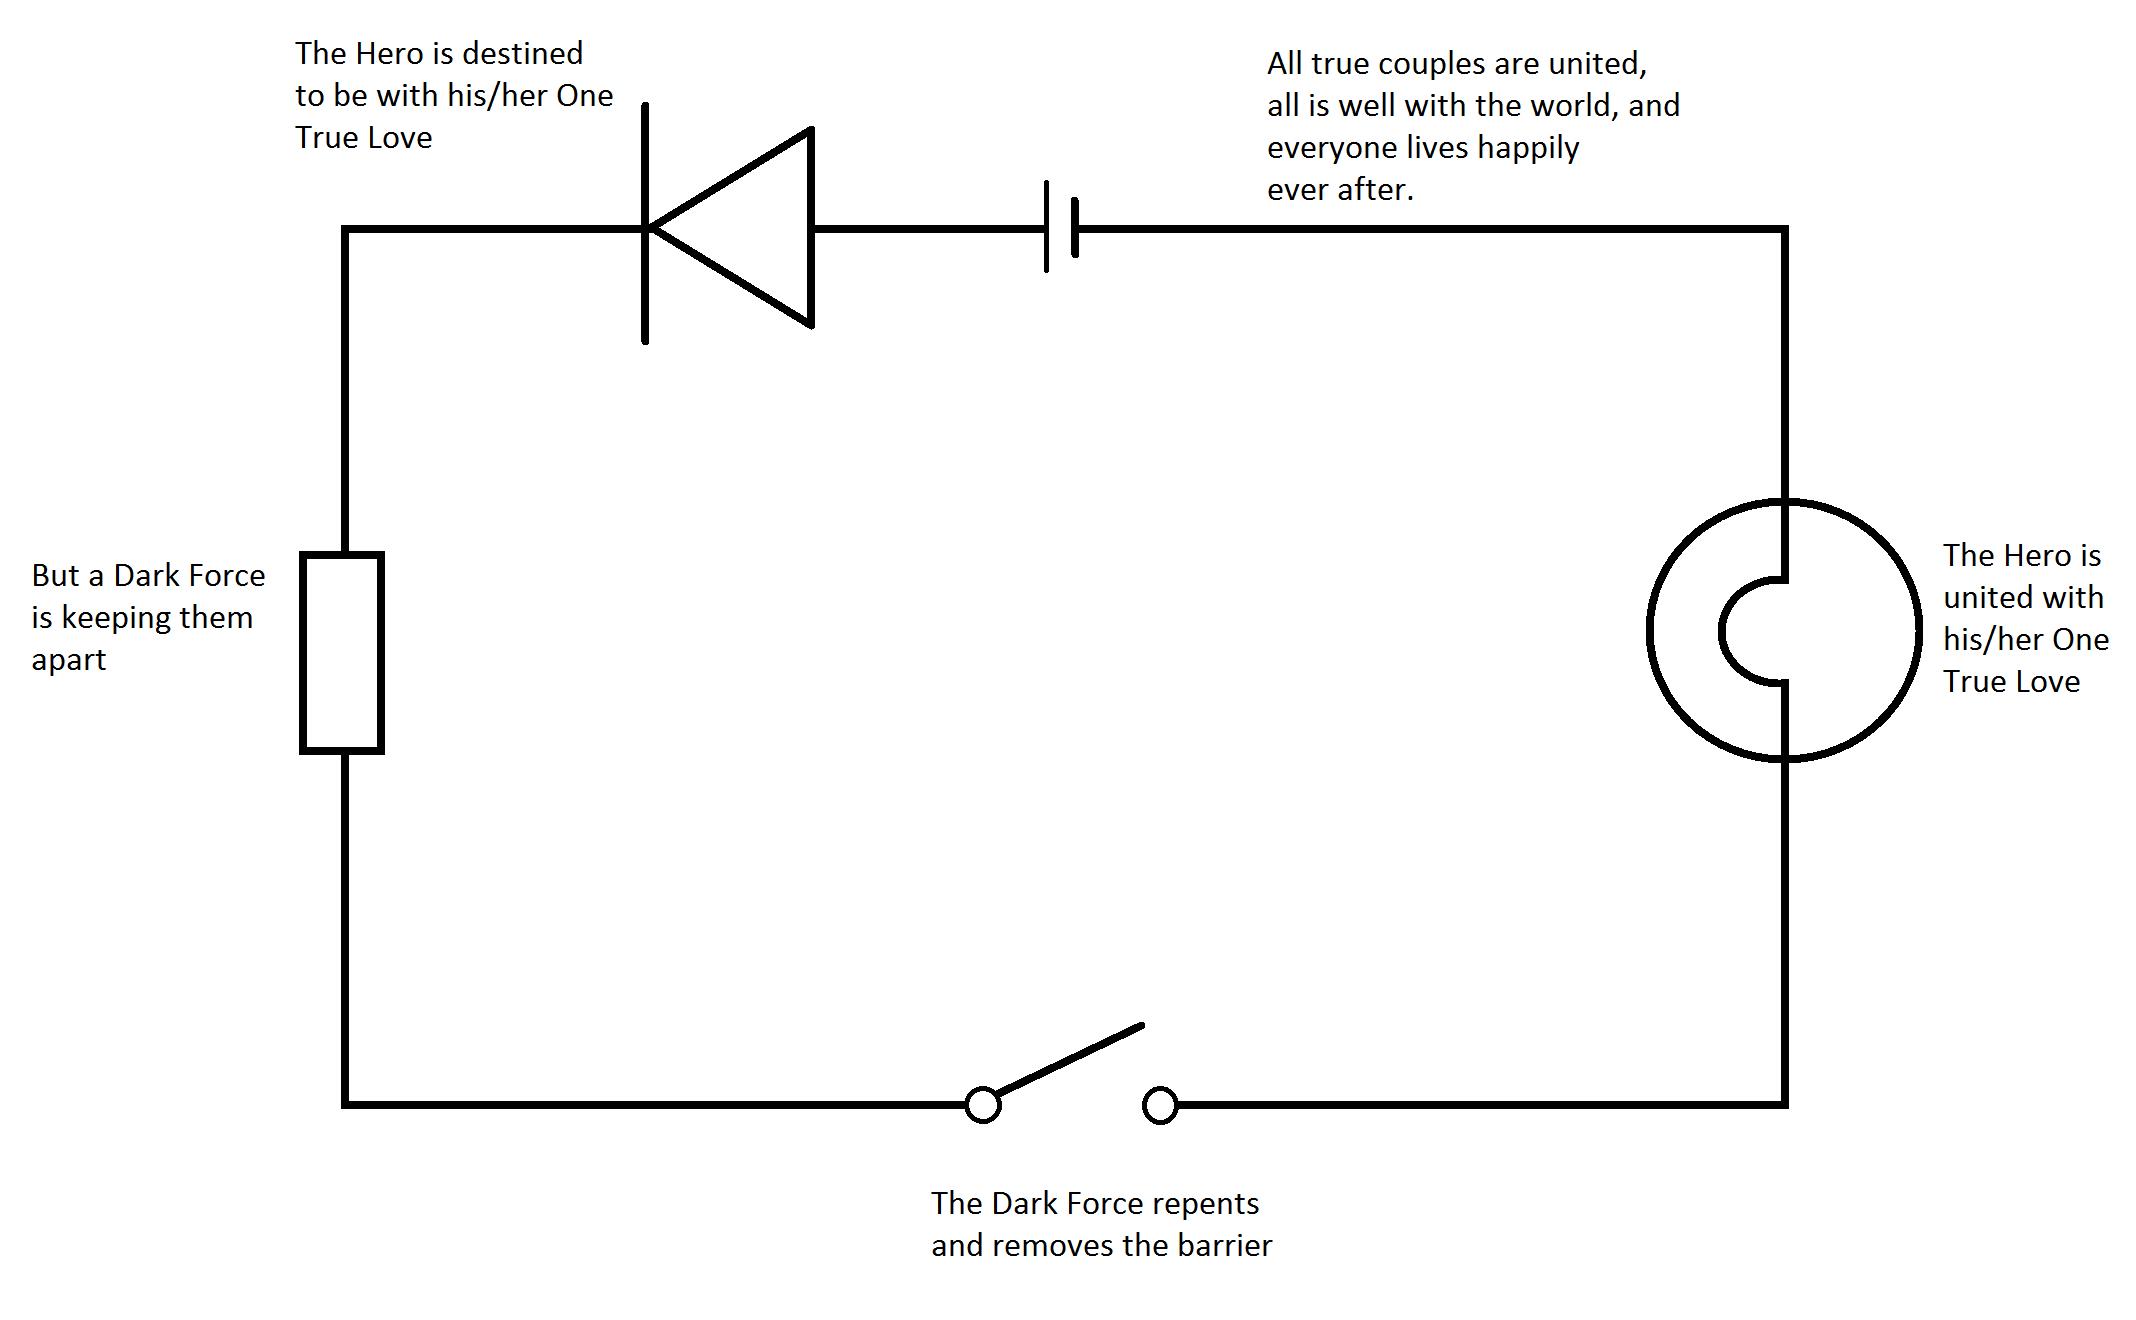 Basic Electrical Wiring Diagrams - Wiring Diagram Explained - Basic House Wiring Diagram